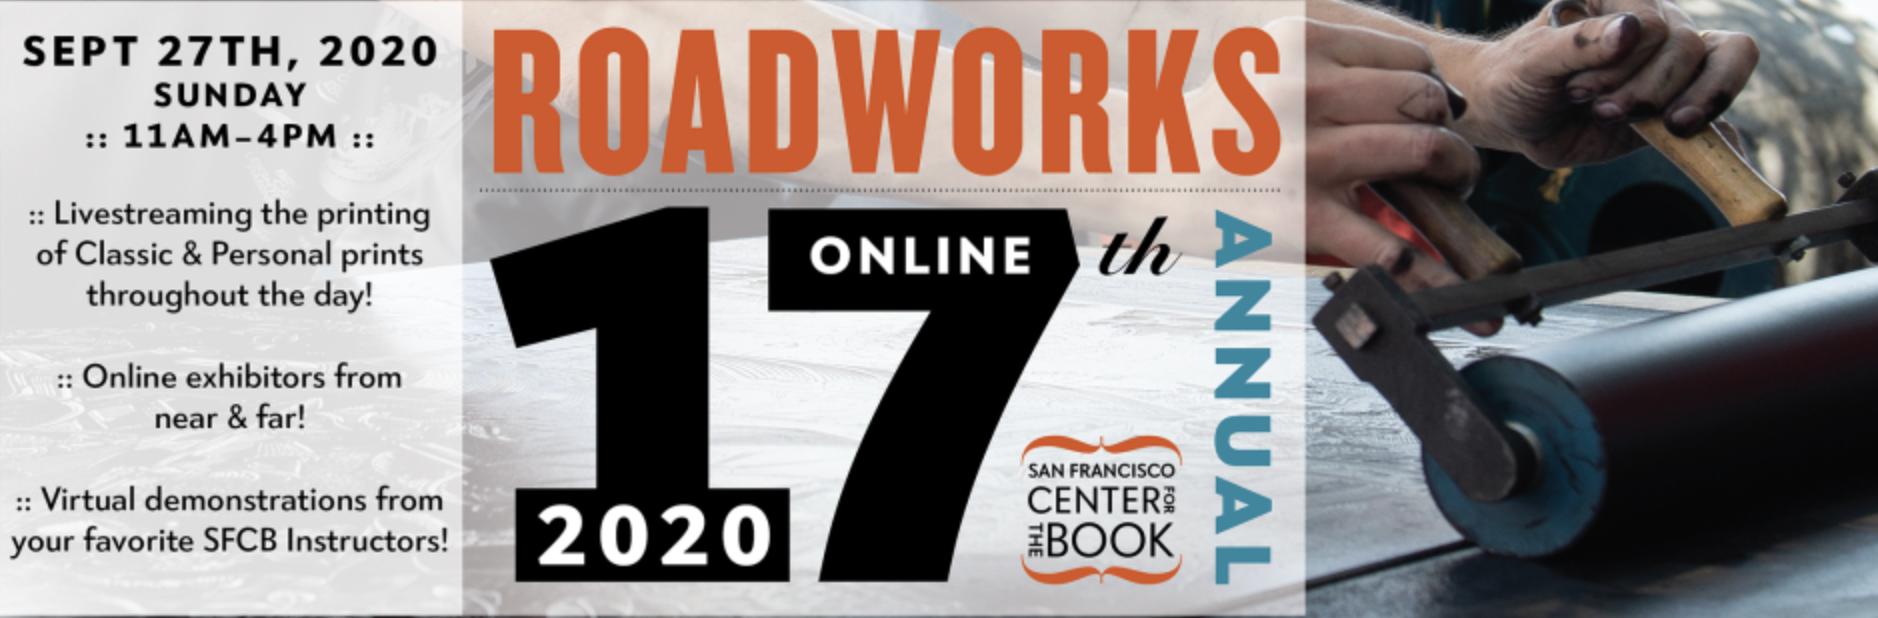 Roadworks banner